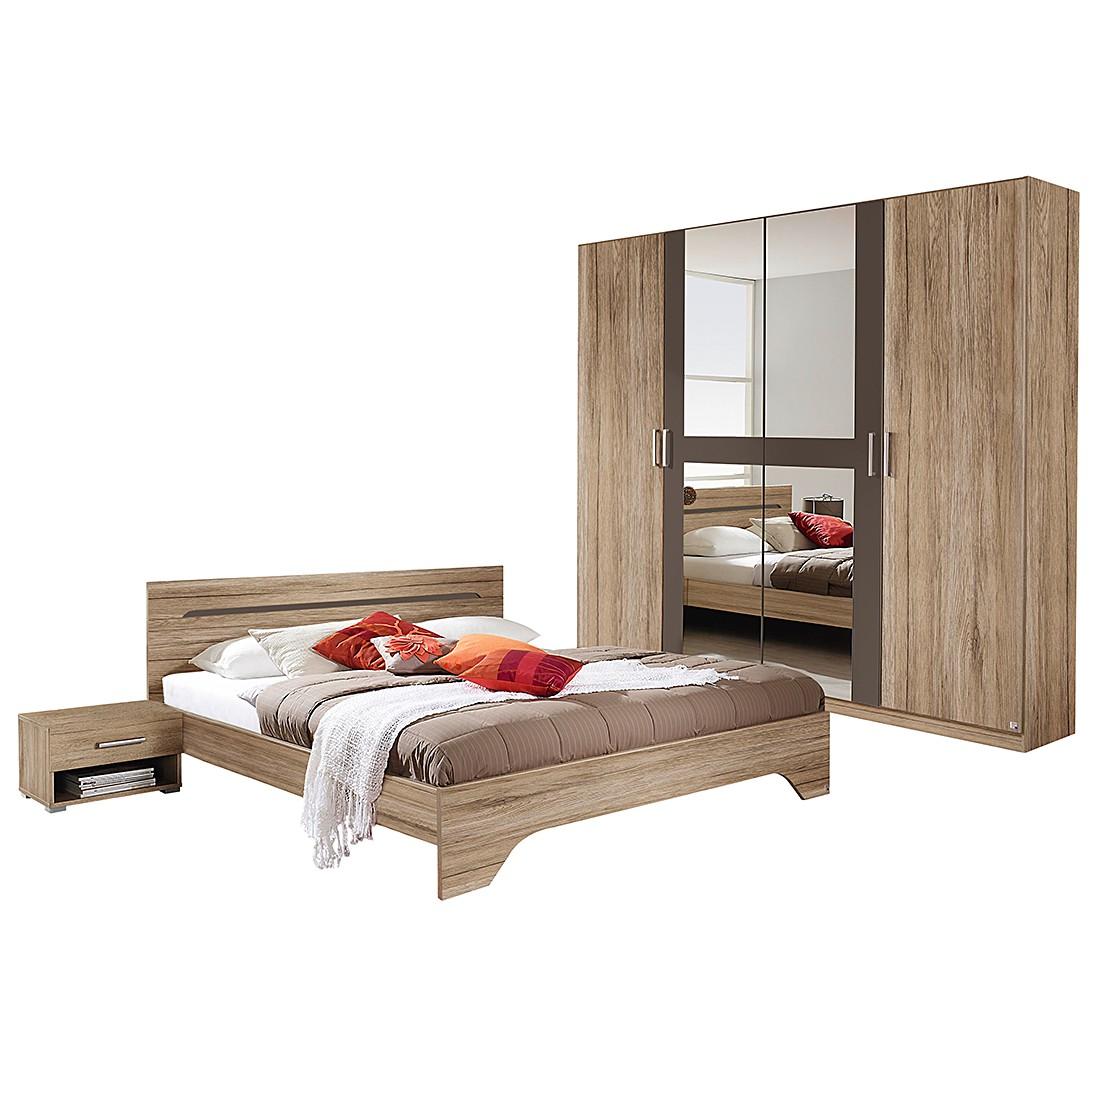 Schlafzimmerset Rubi I 4 Teilig Sanremo Eiche Dekor Lavagrau